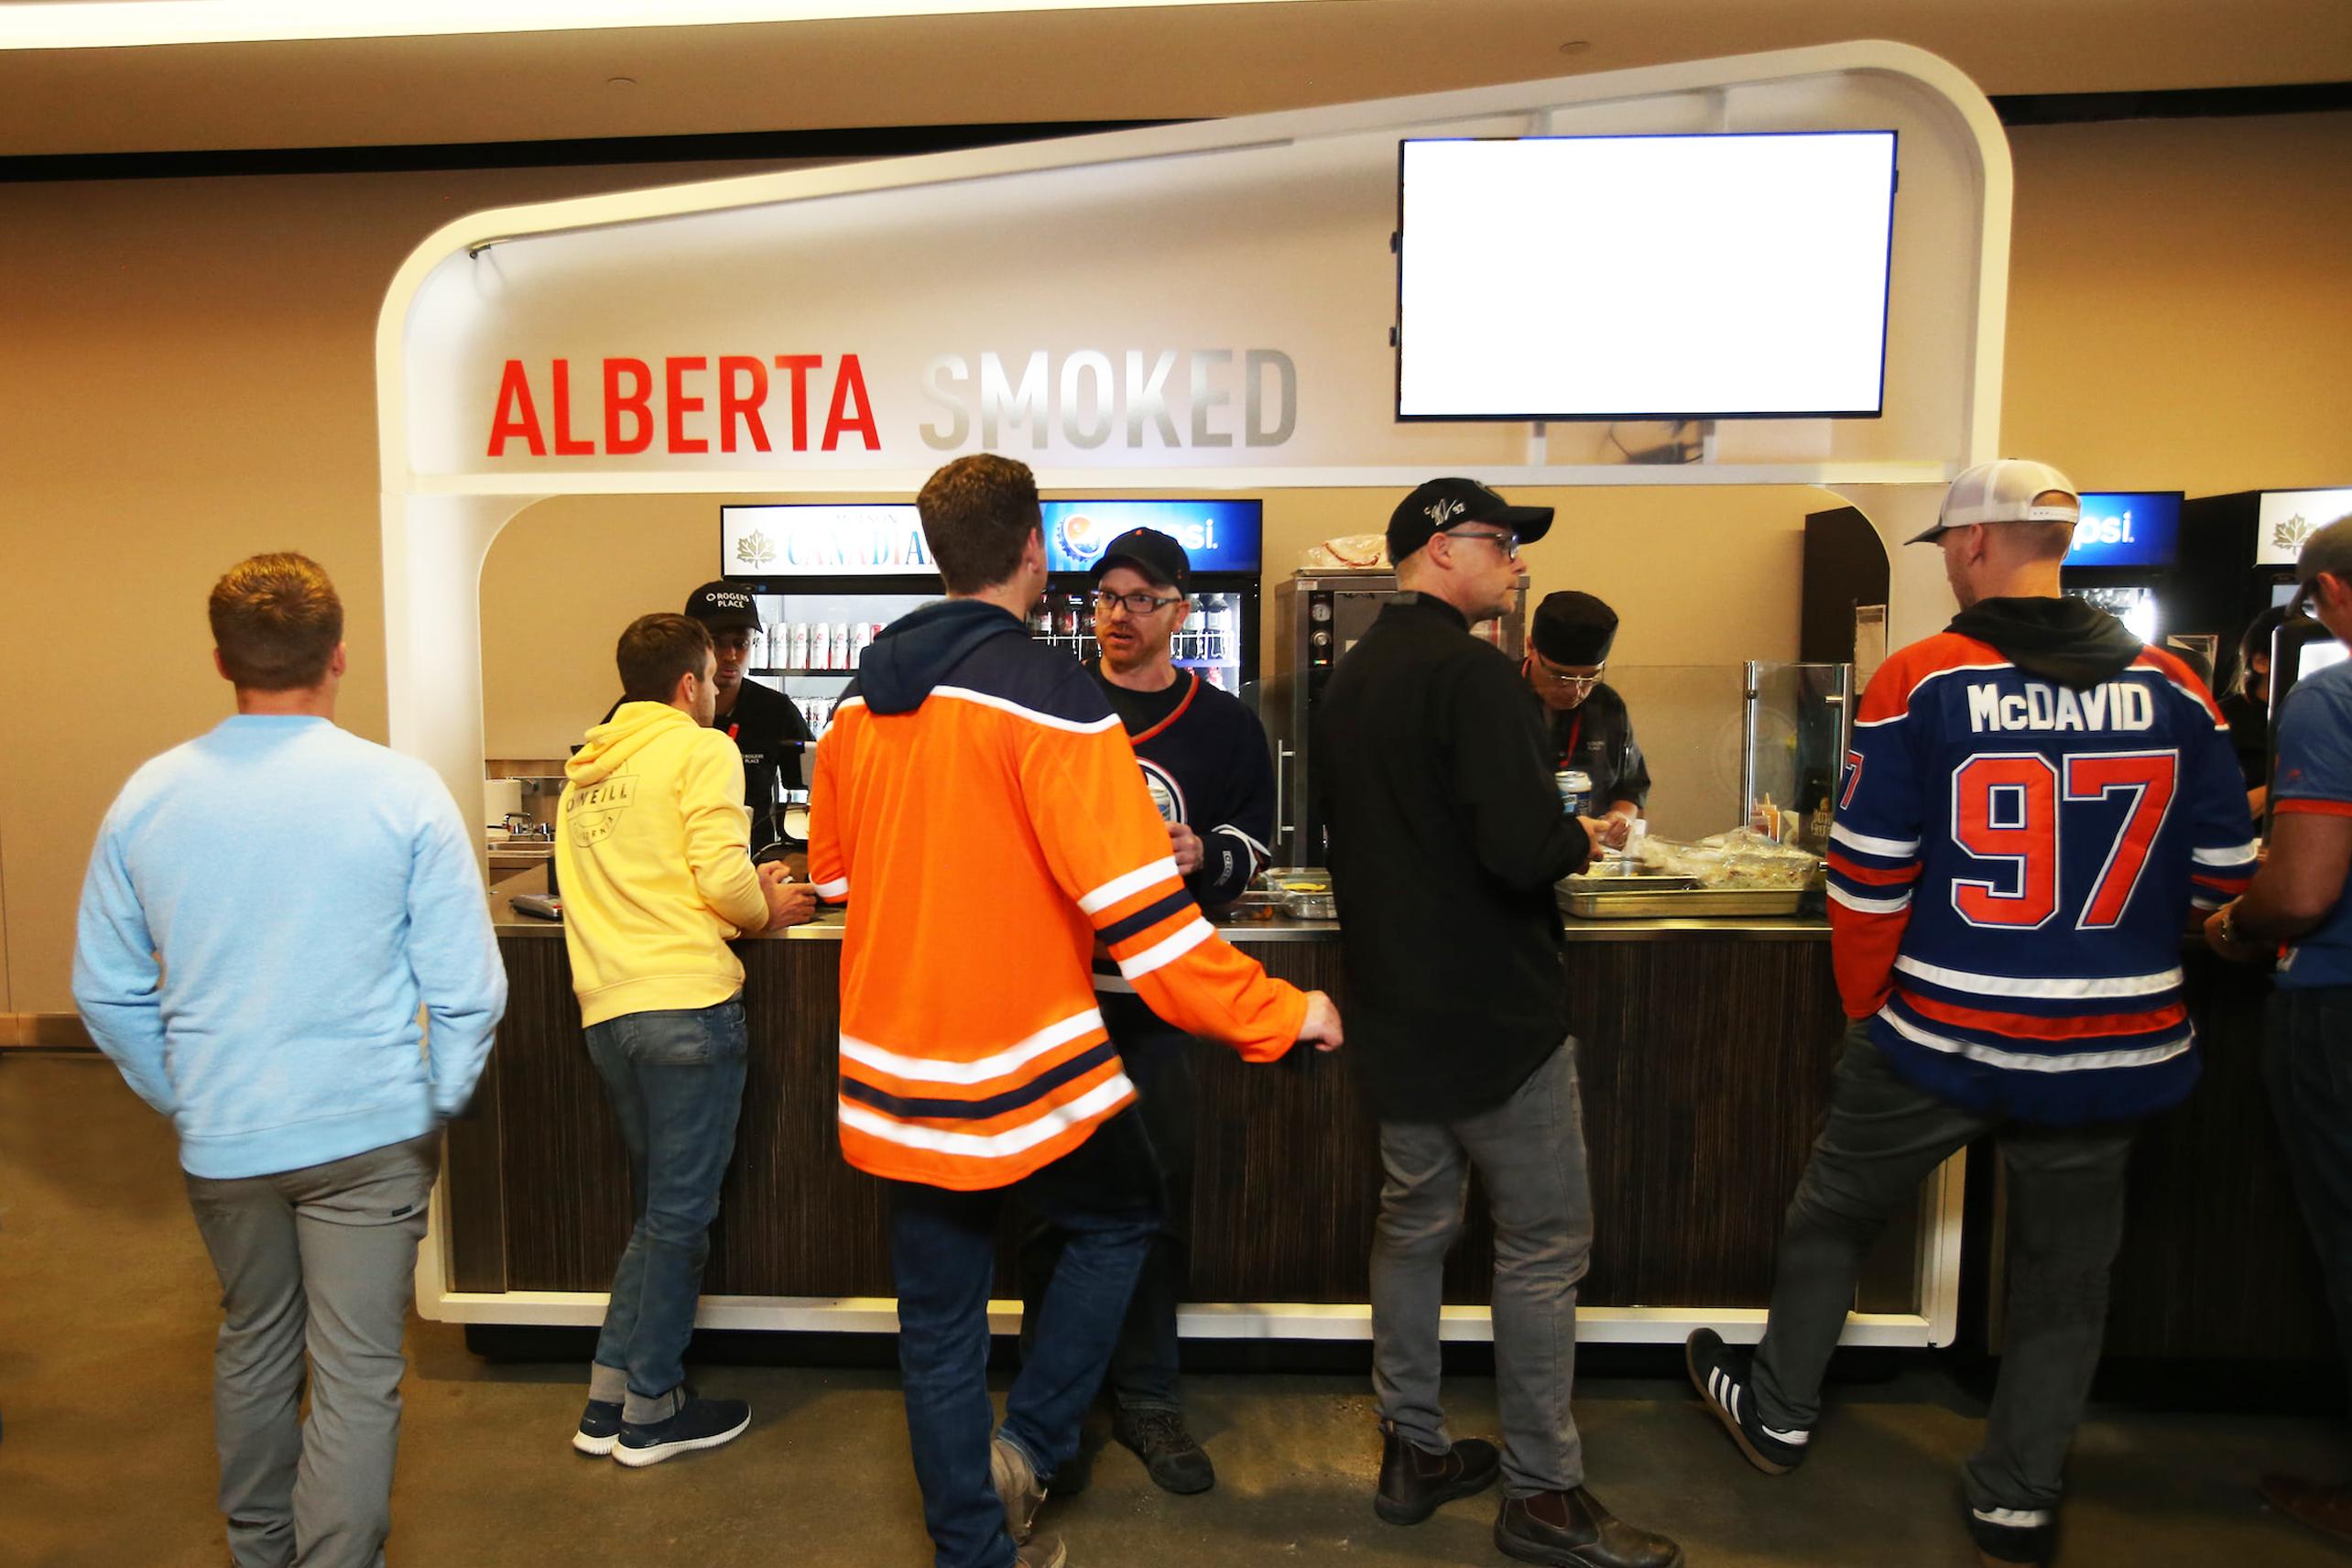 Alberta Smoked (Upper Concourse)